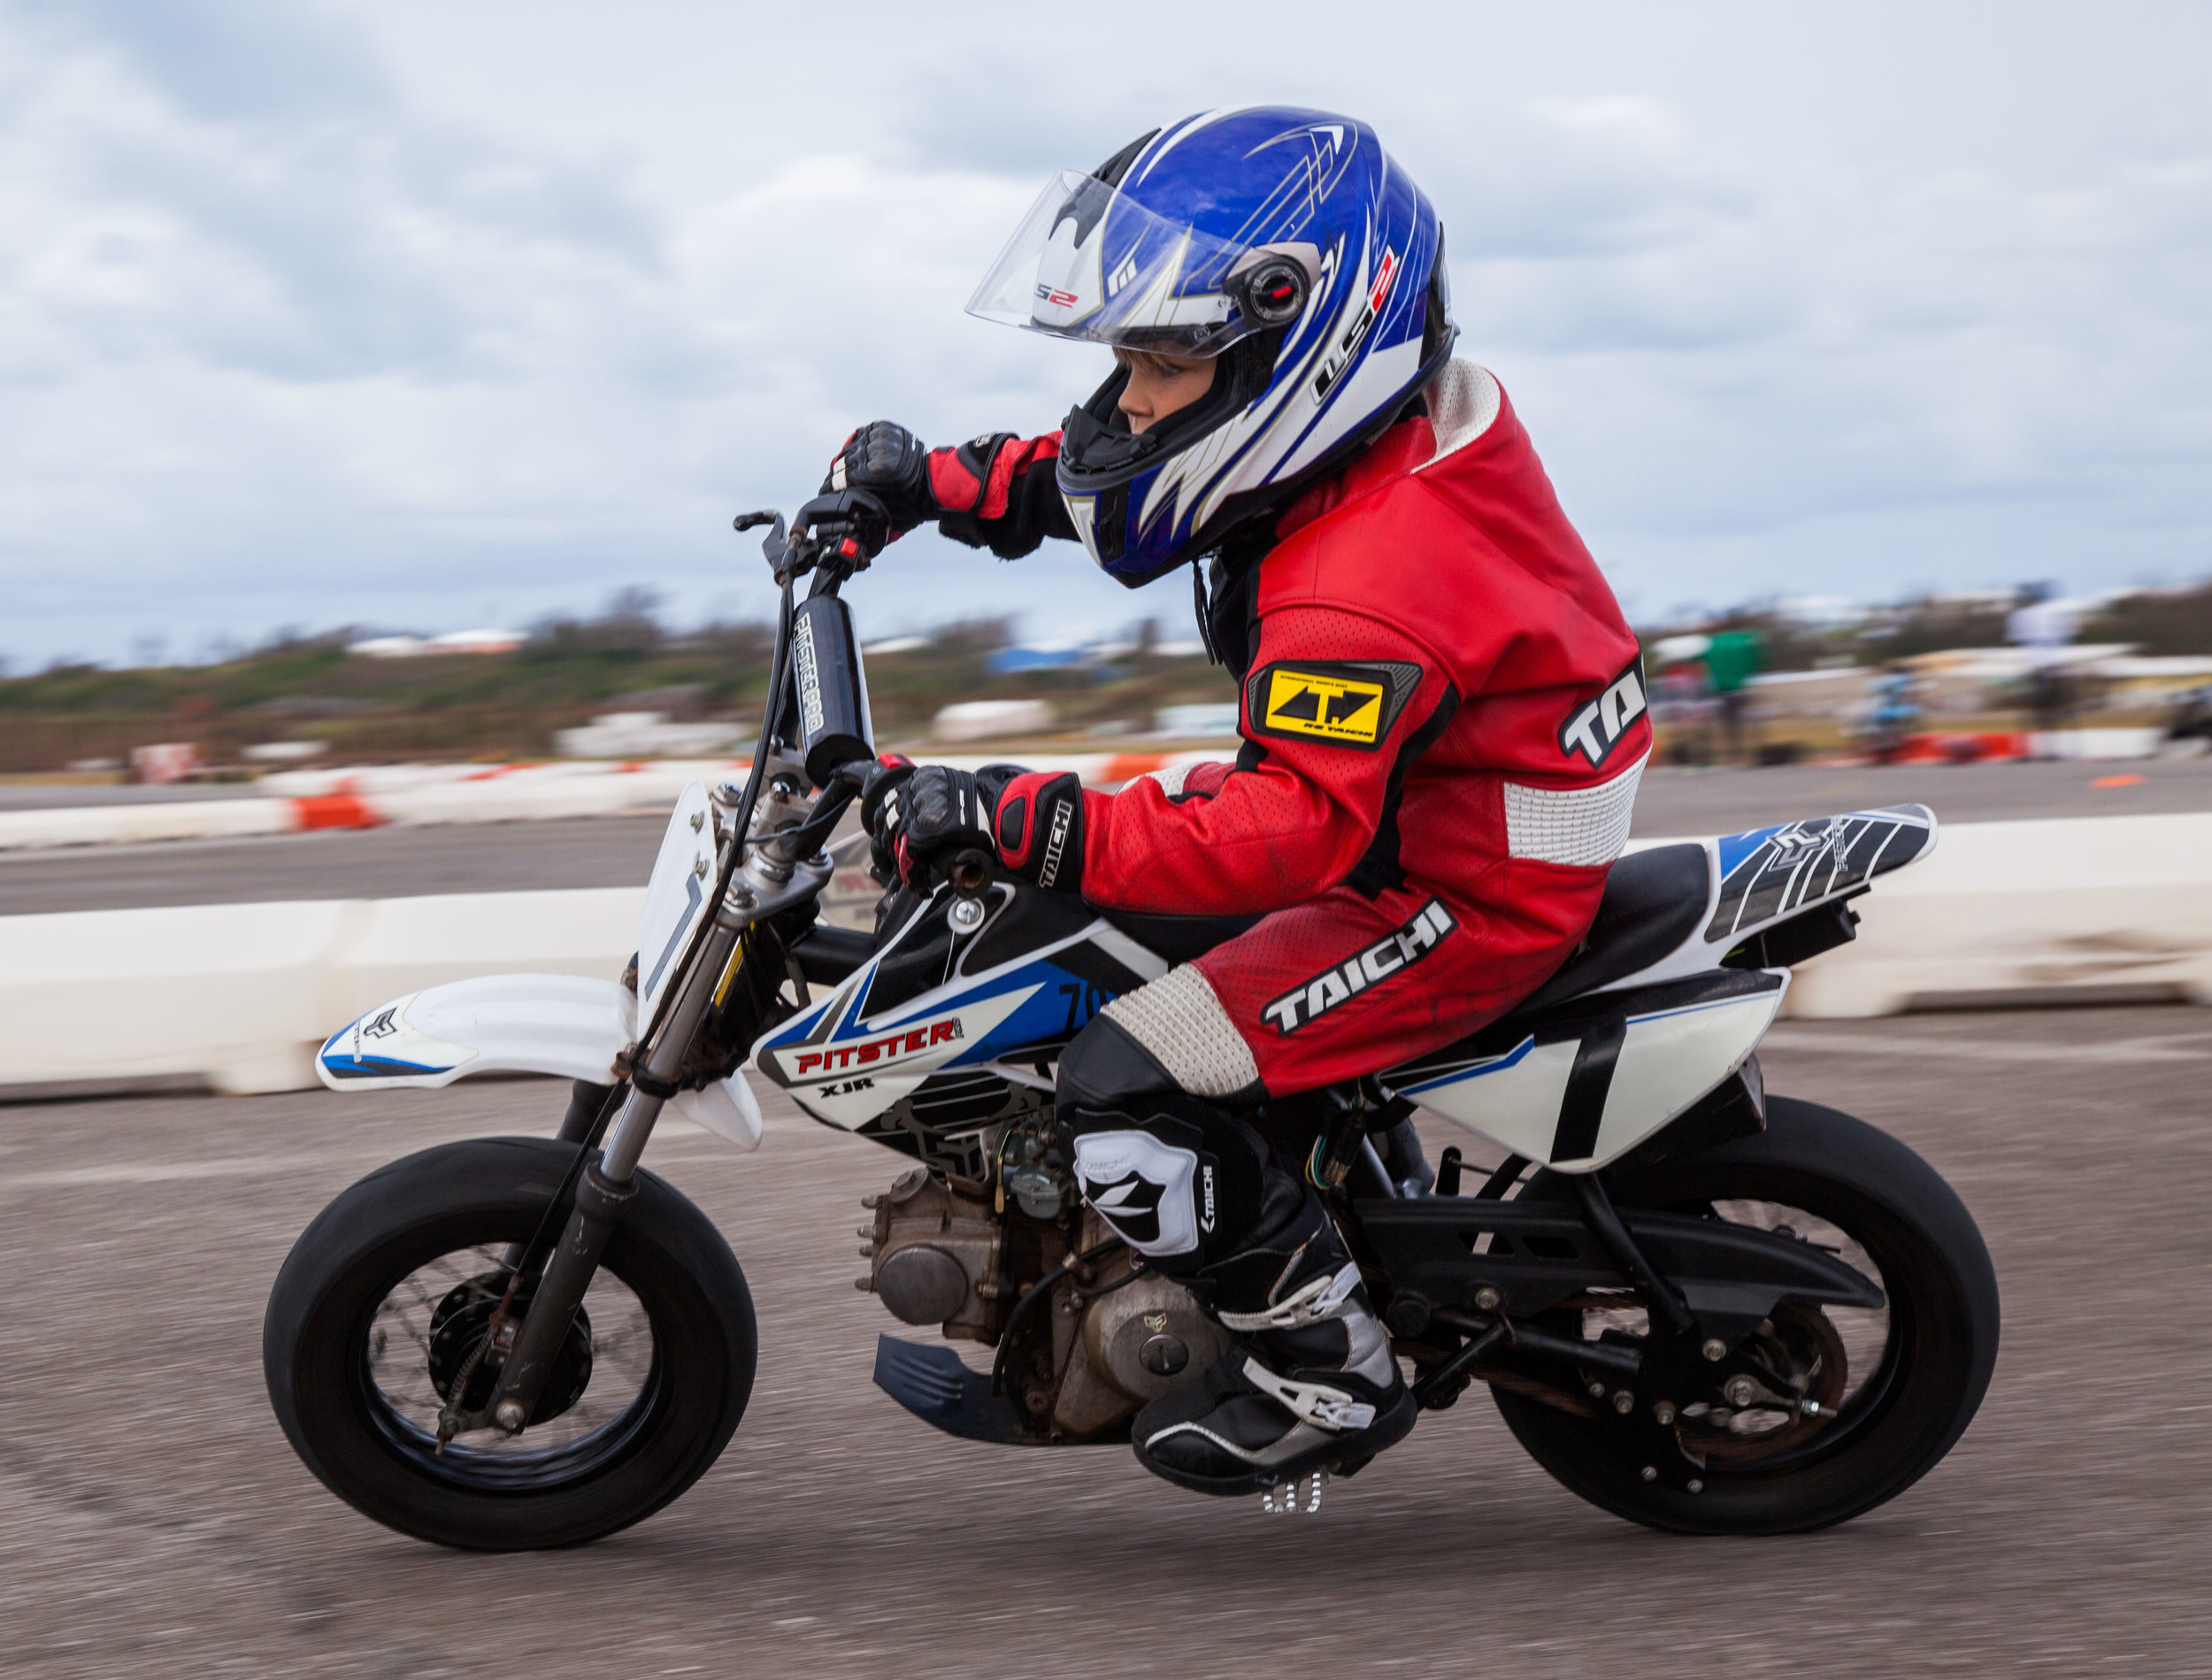 Ryan Chequer - A BMRC Riding Clinic Rider